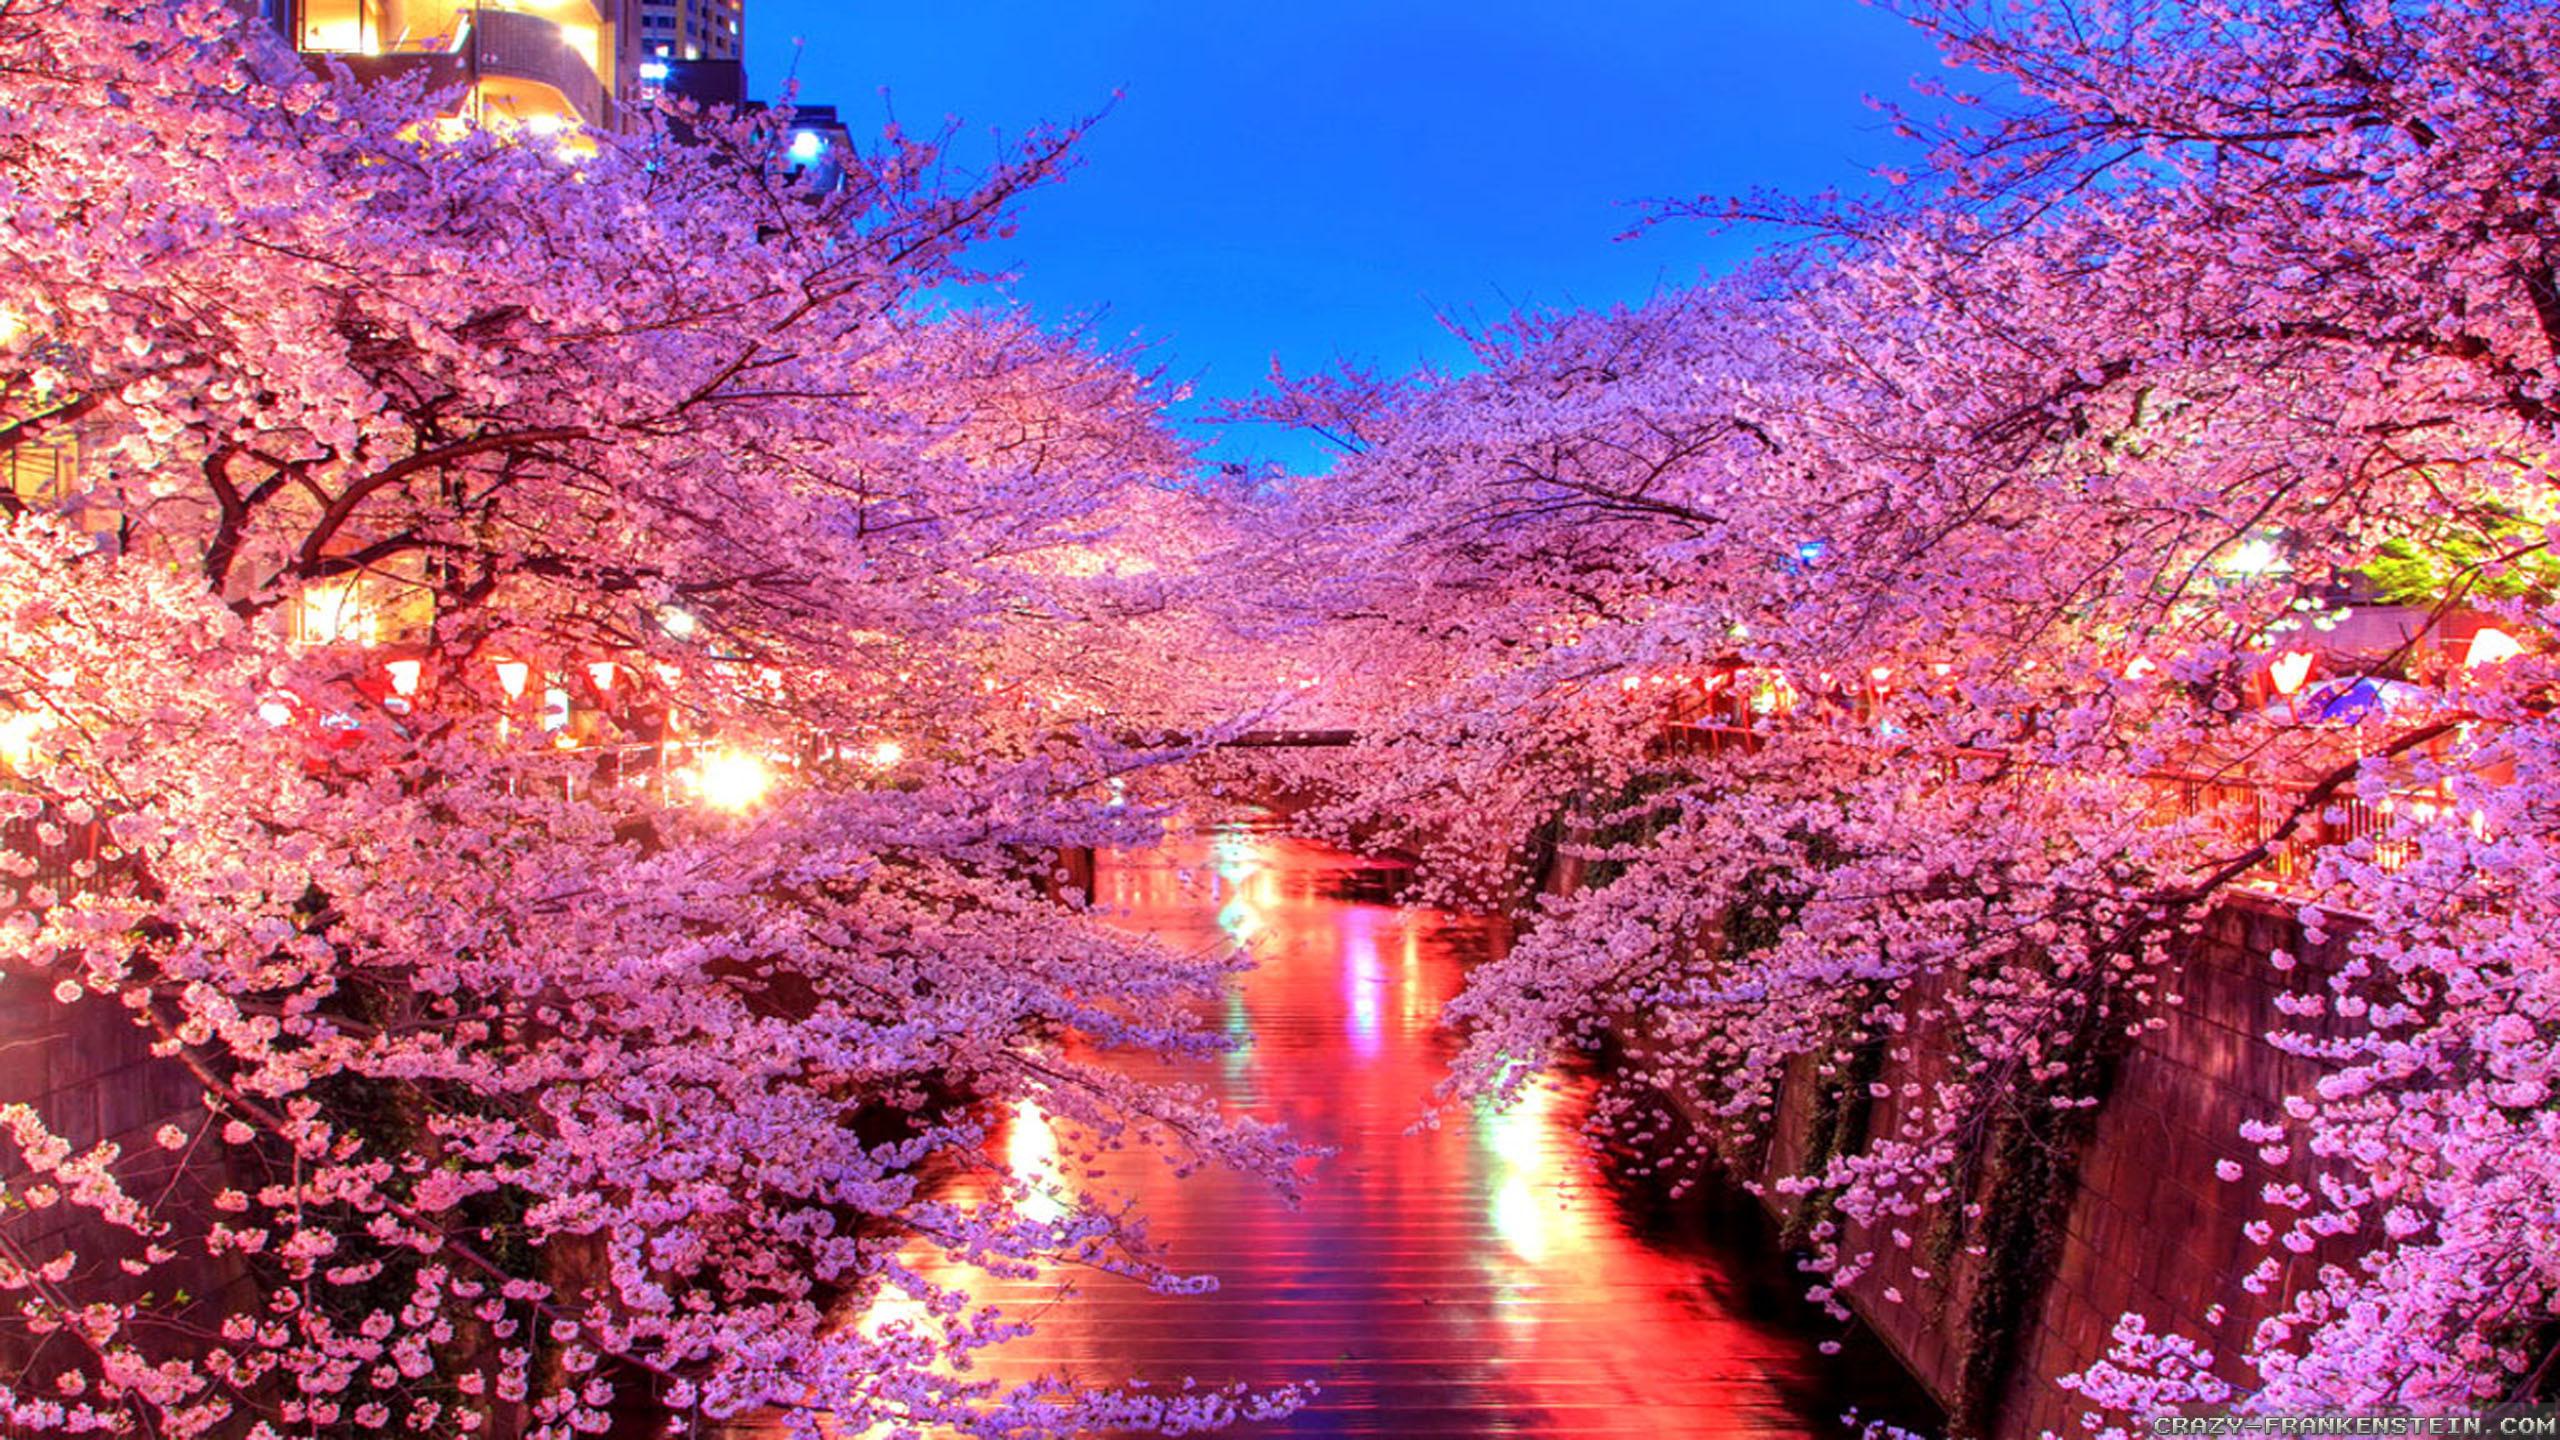 Res: 2560x1440, Japan Wallpaper HD